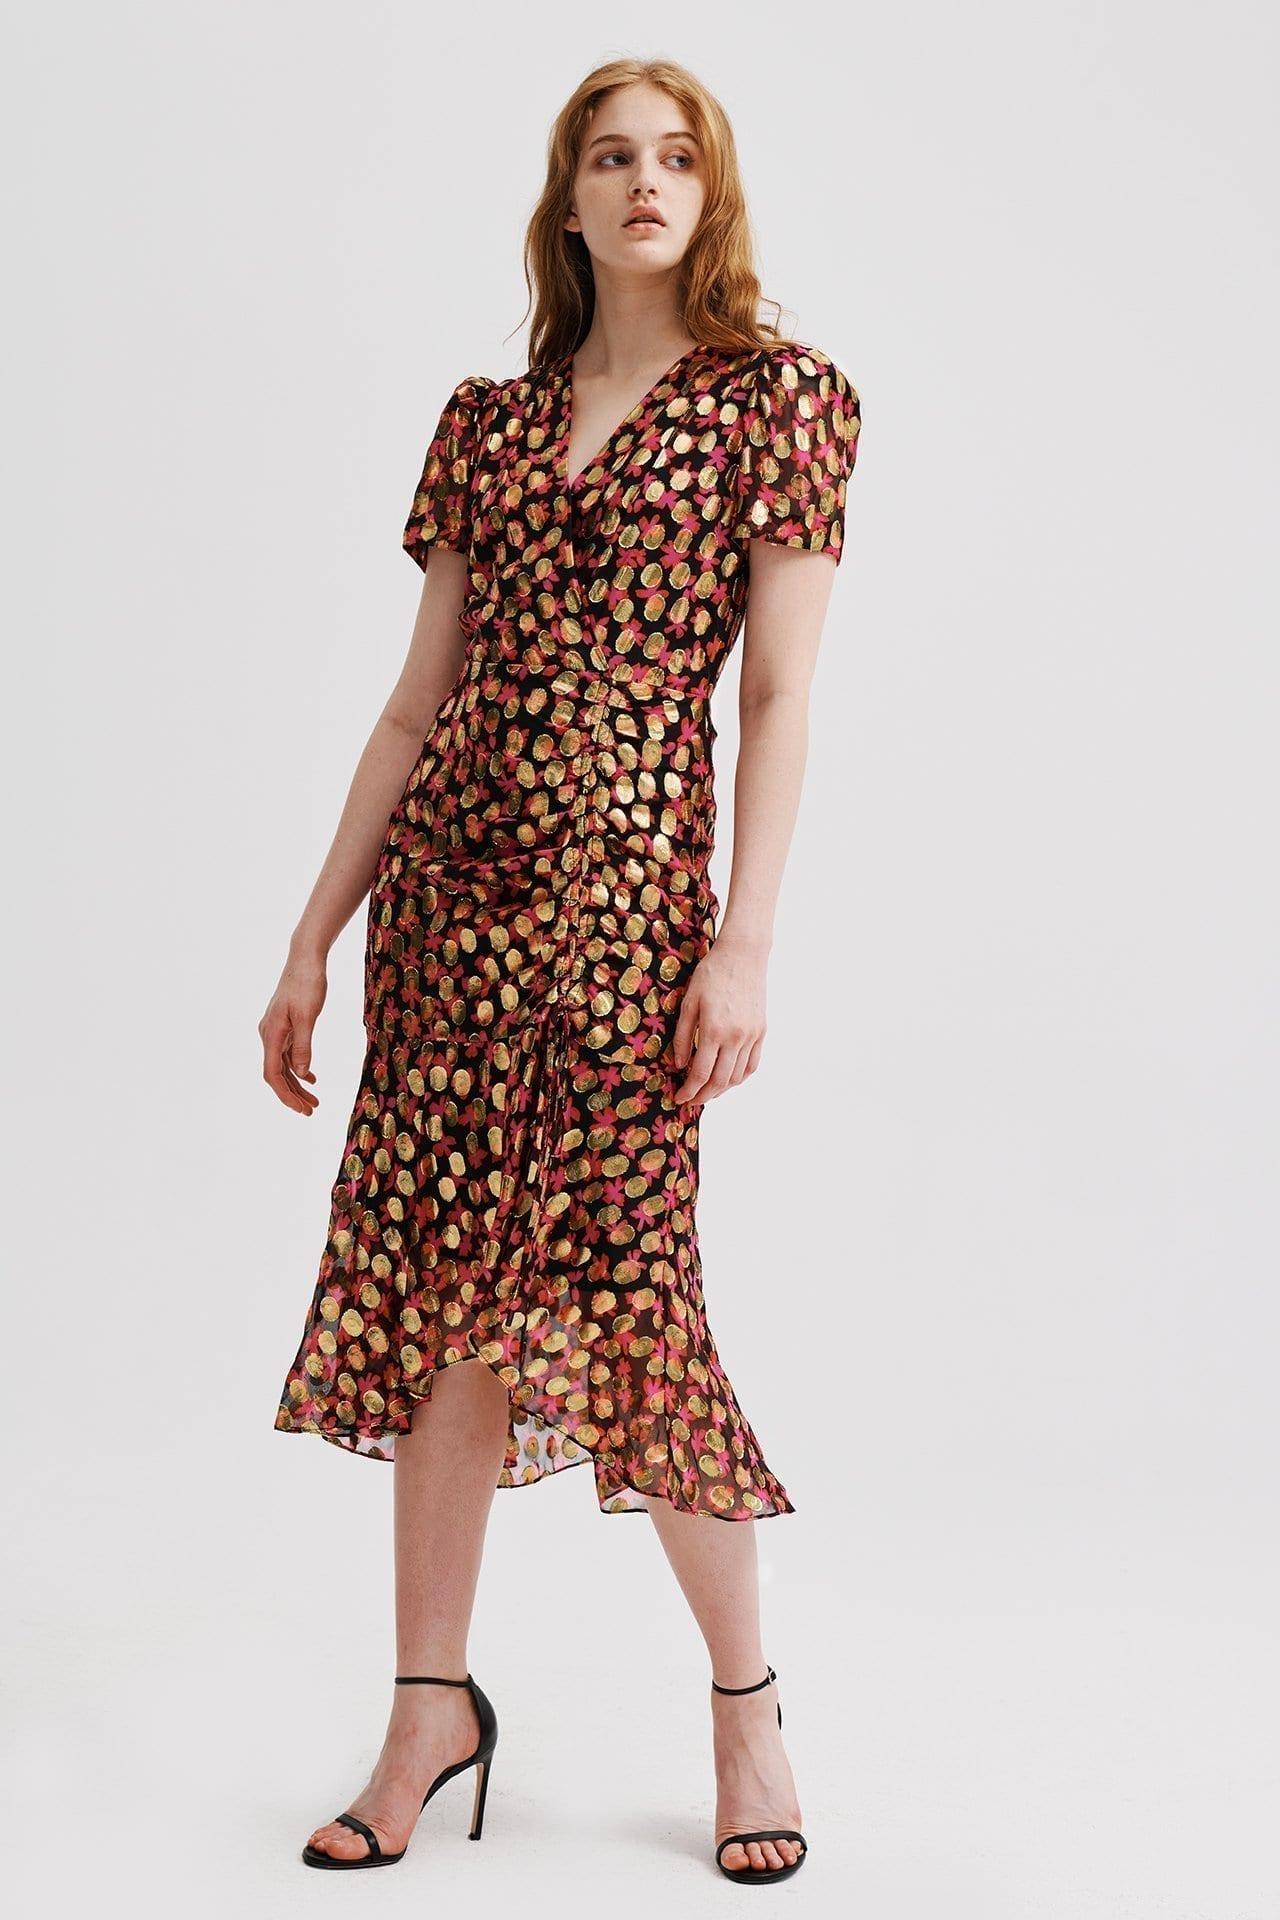 MILLY Gynn Floral Lurex Clipping Dress